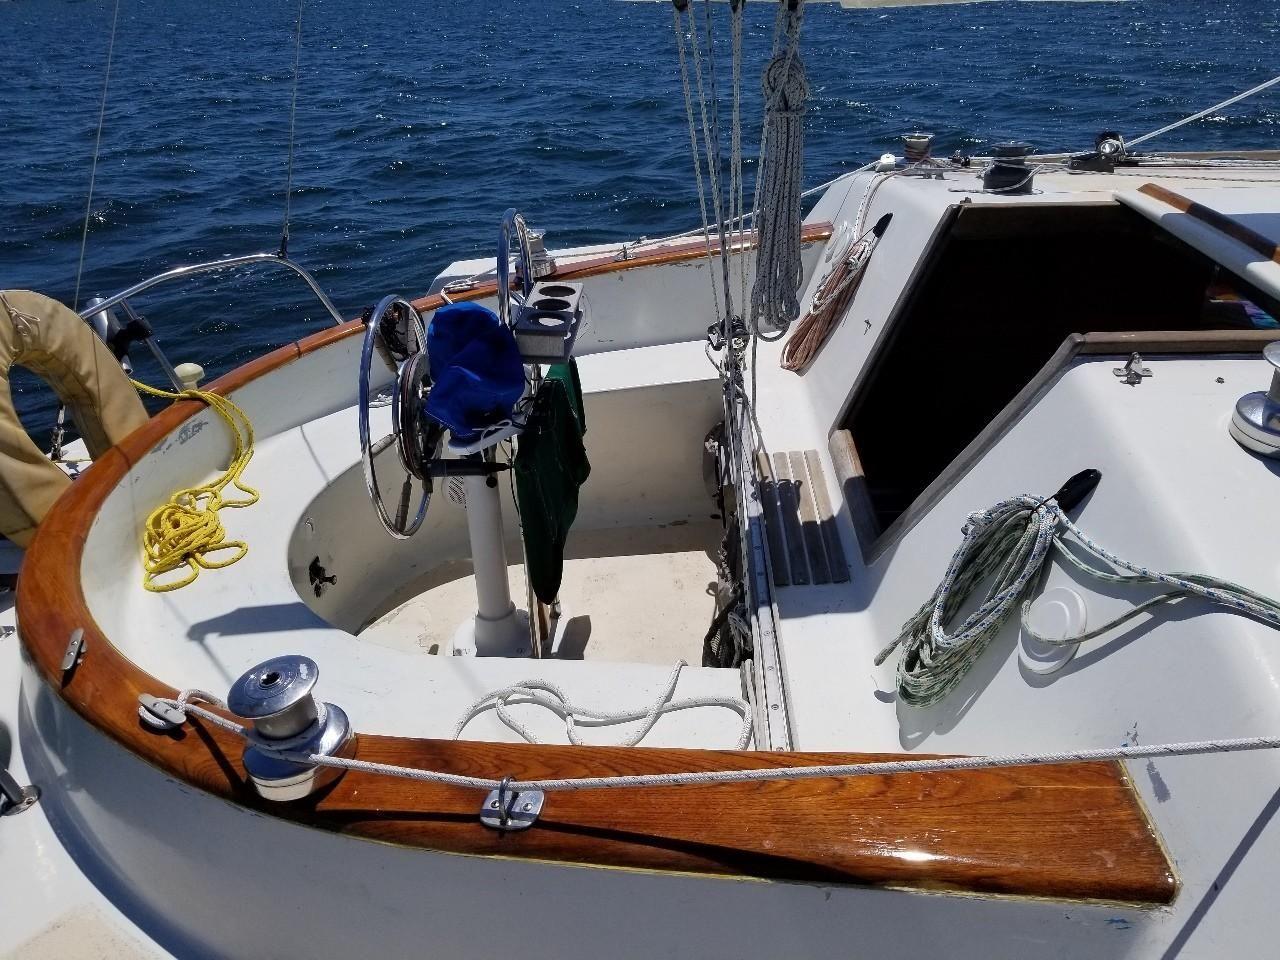 1978 Used Norman Cross 34 Trimaran Sailboat For Sale